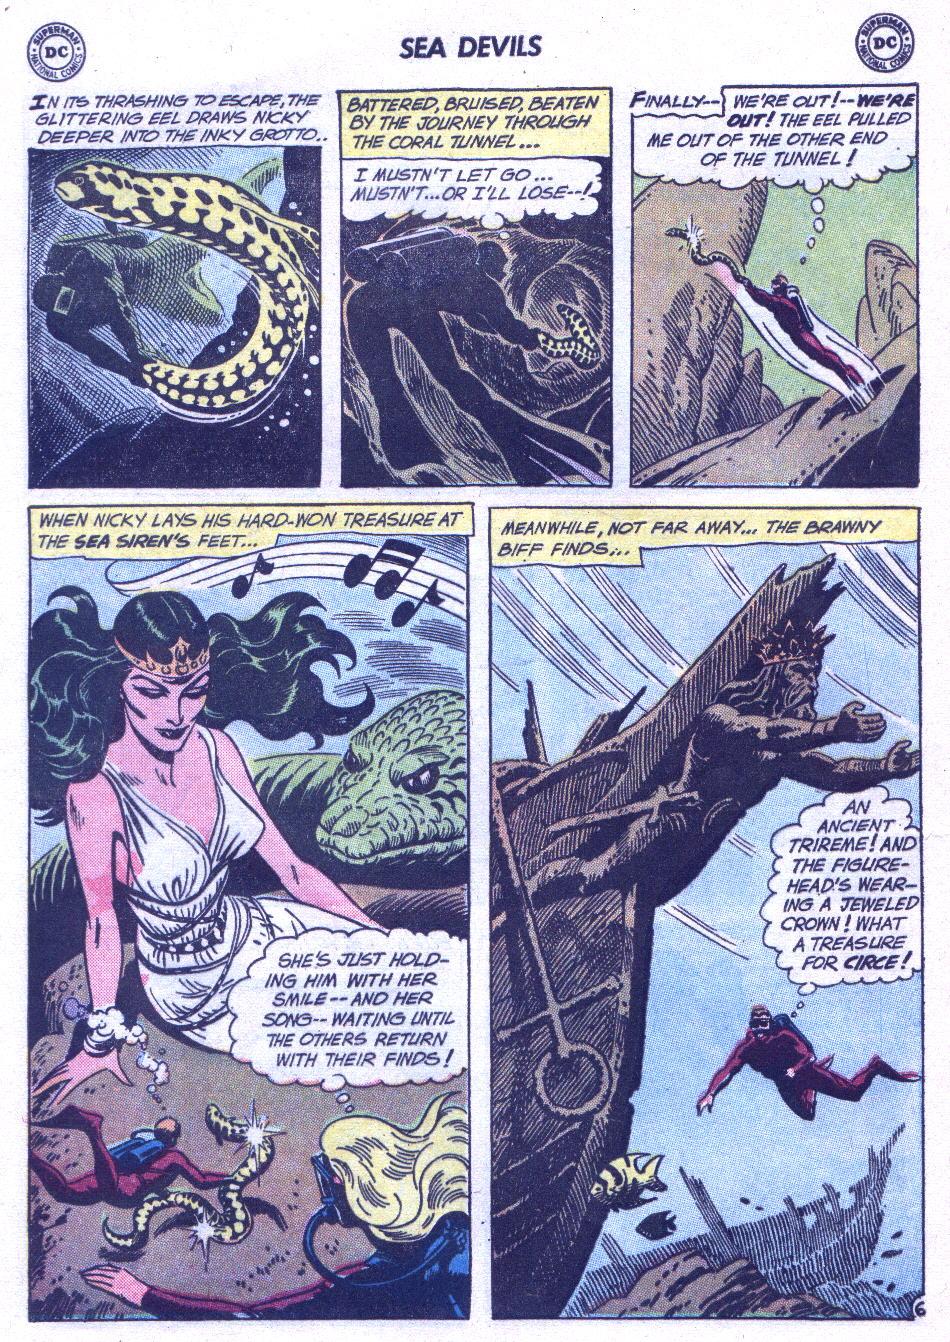 Read online Sea Devils comic -  Issue #3 - 25